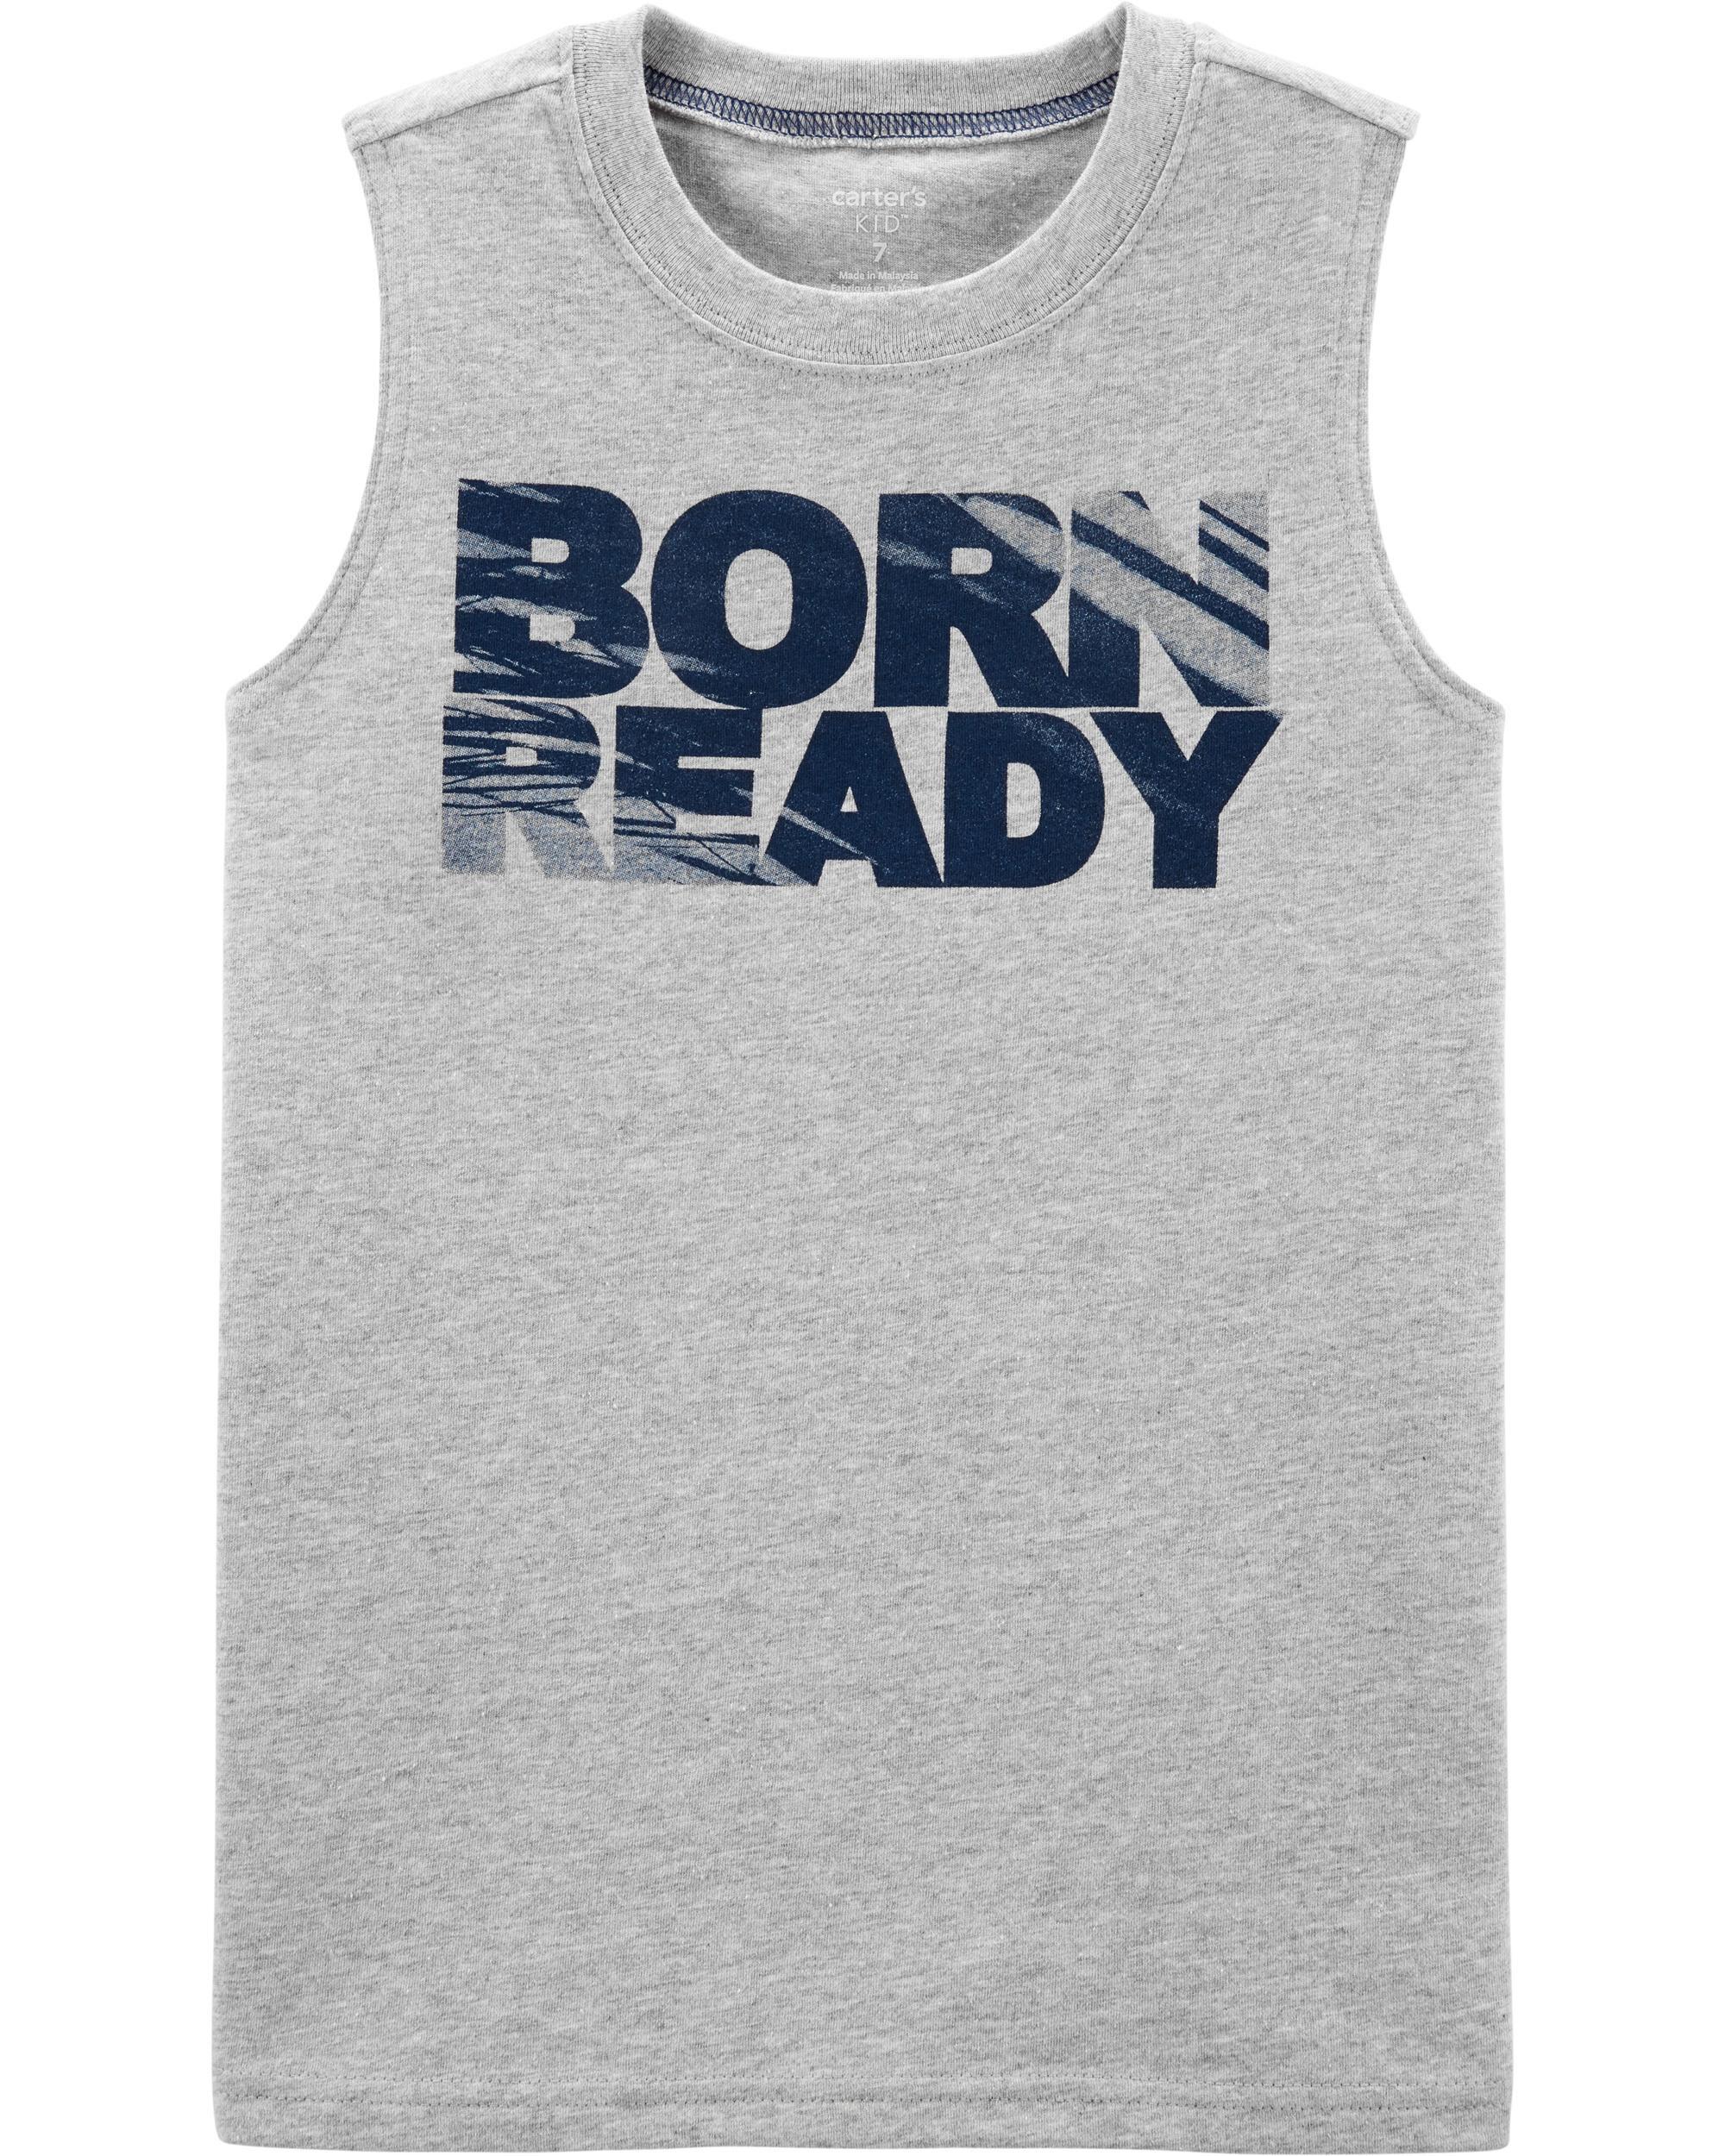 *Clearance*  Born Ready Jersey Tank